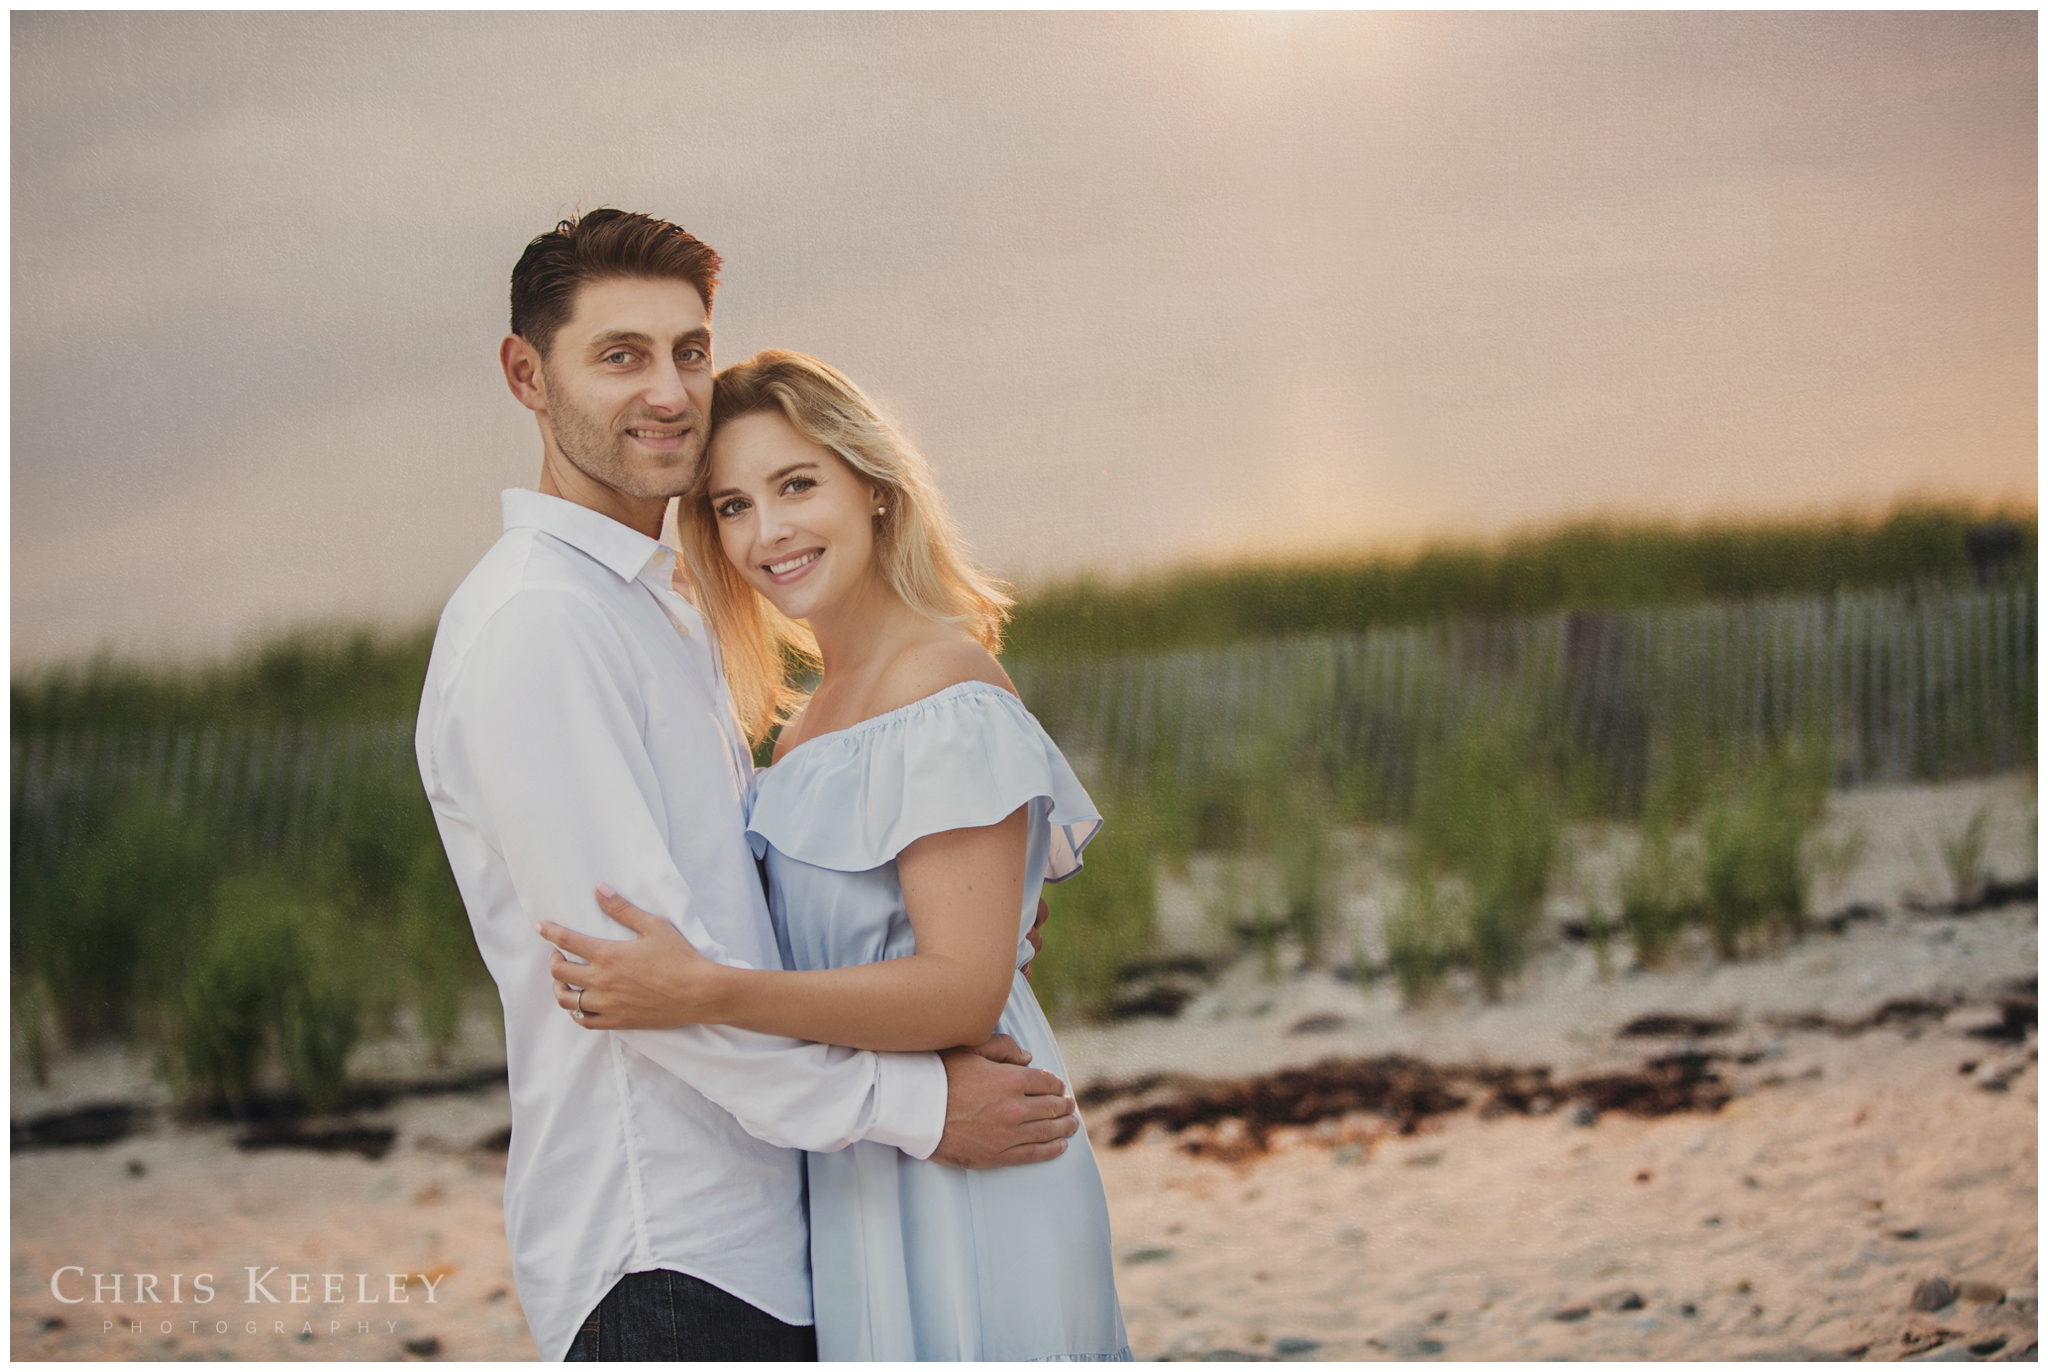 dover-new-hampshire-wedding-photographer-chris-keeley-photography-05.jpg